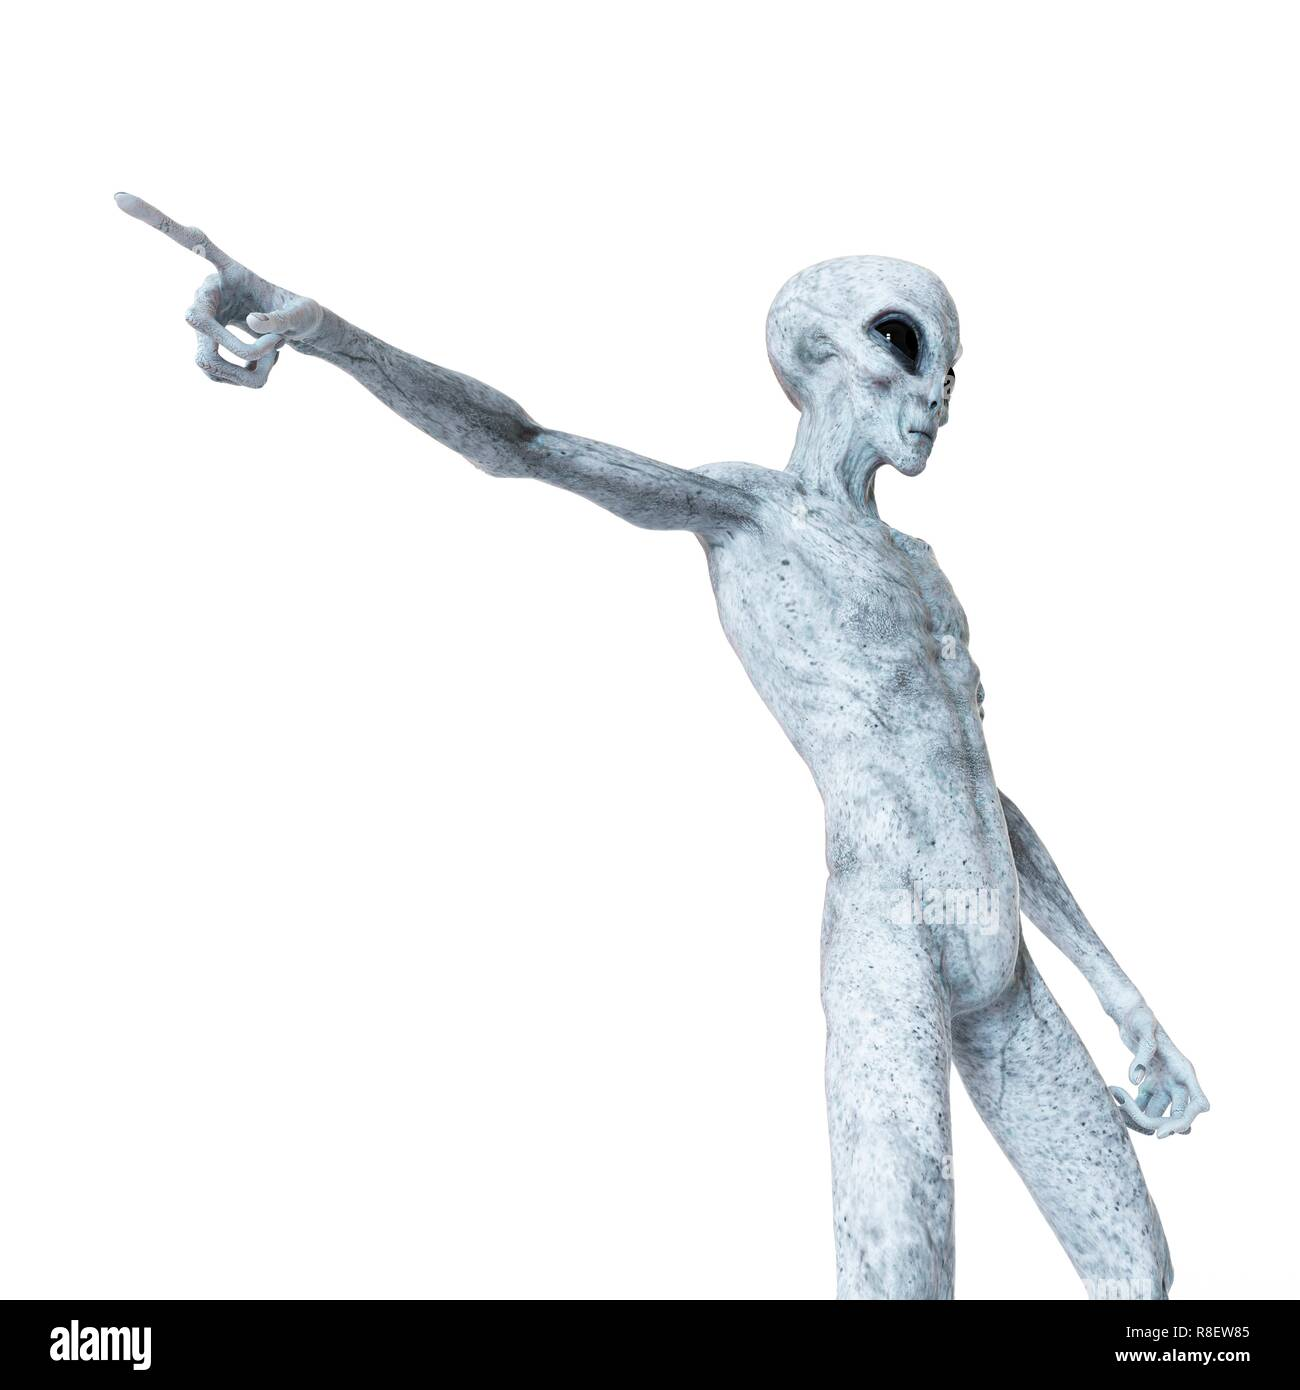 Illustration of a humanoid alien. - Stock Image